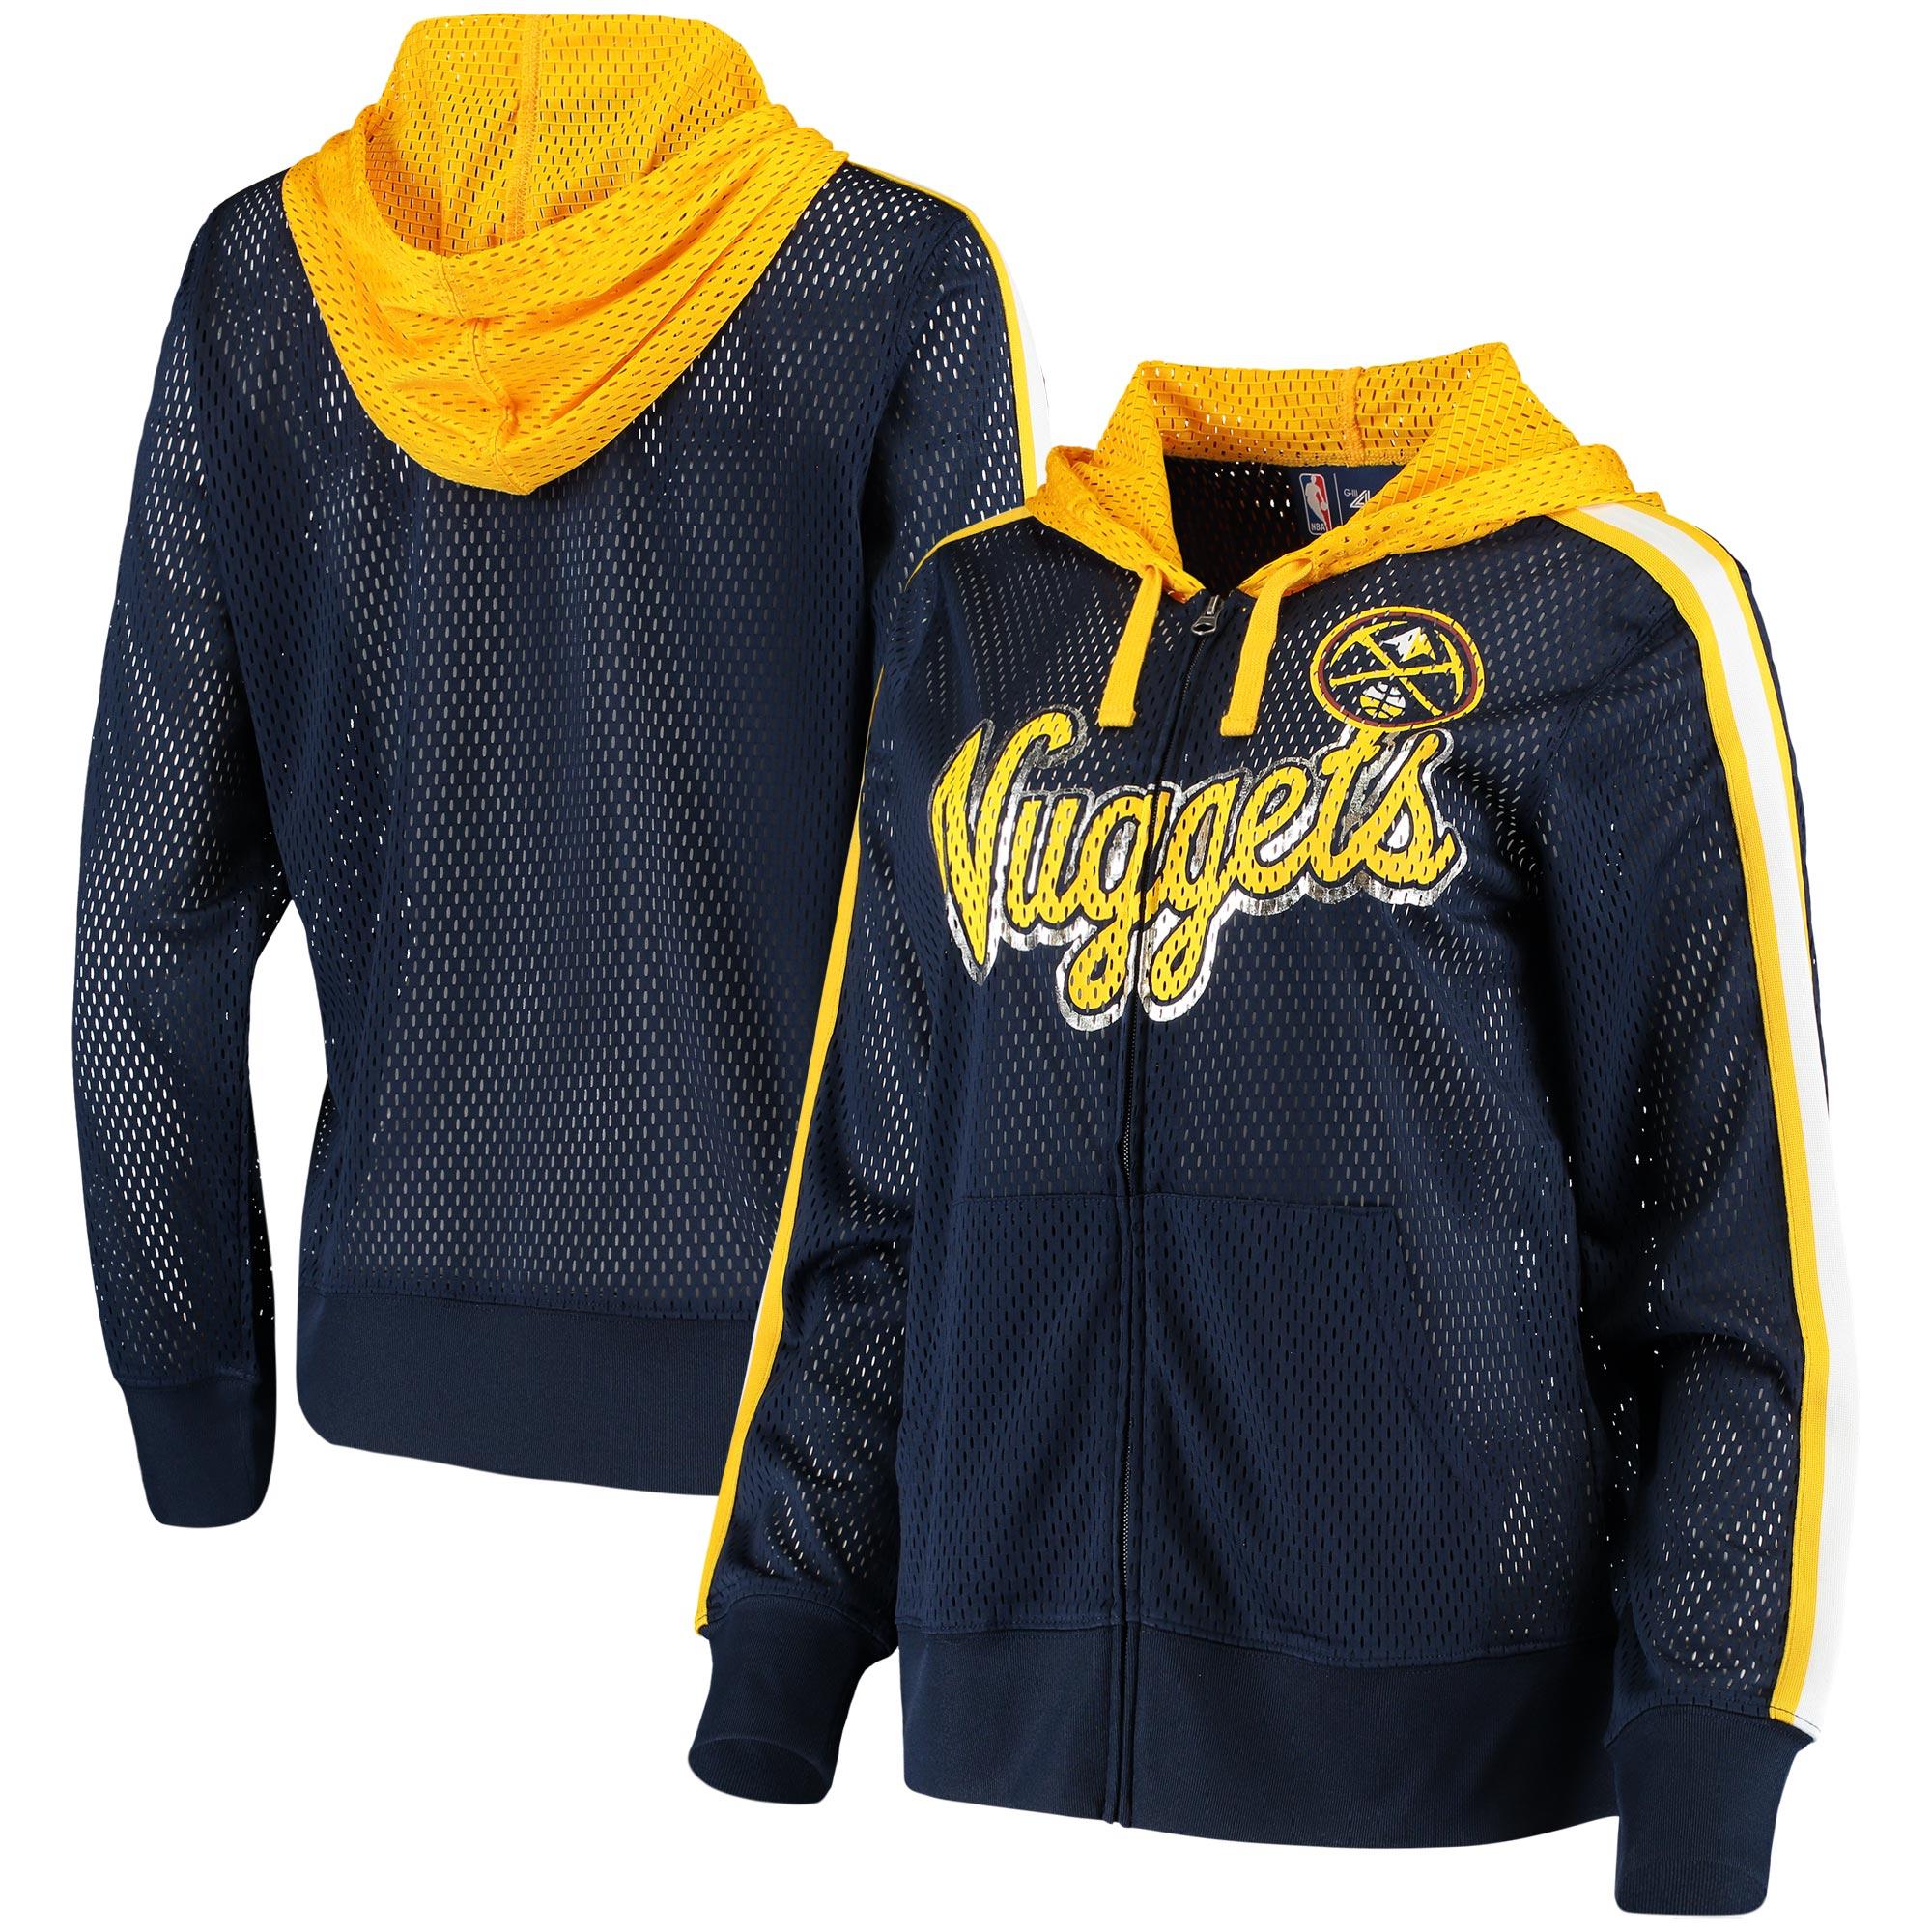 Denver Nuggets G-III 4Her by Carl Banks Women's Top of the Key Foil Mesh Full-Zip Hoodie - Navy/Gold